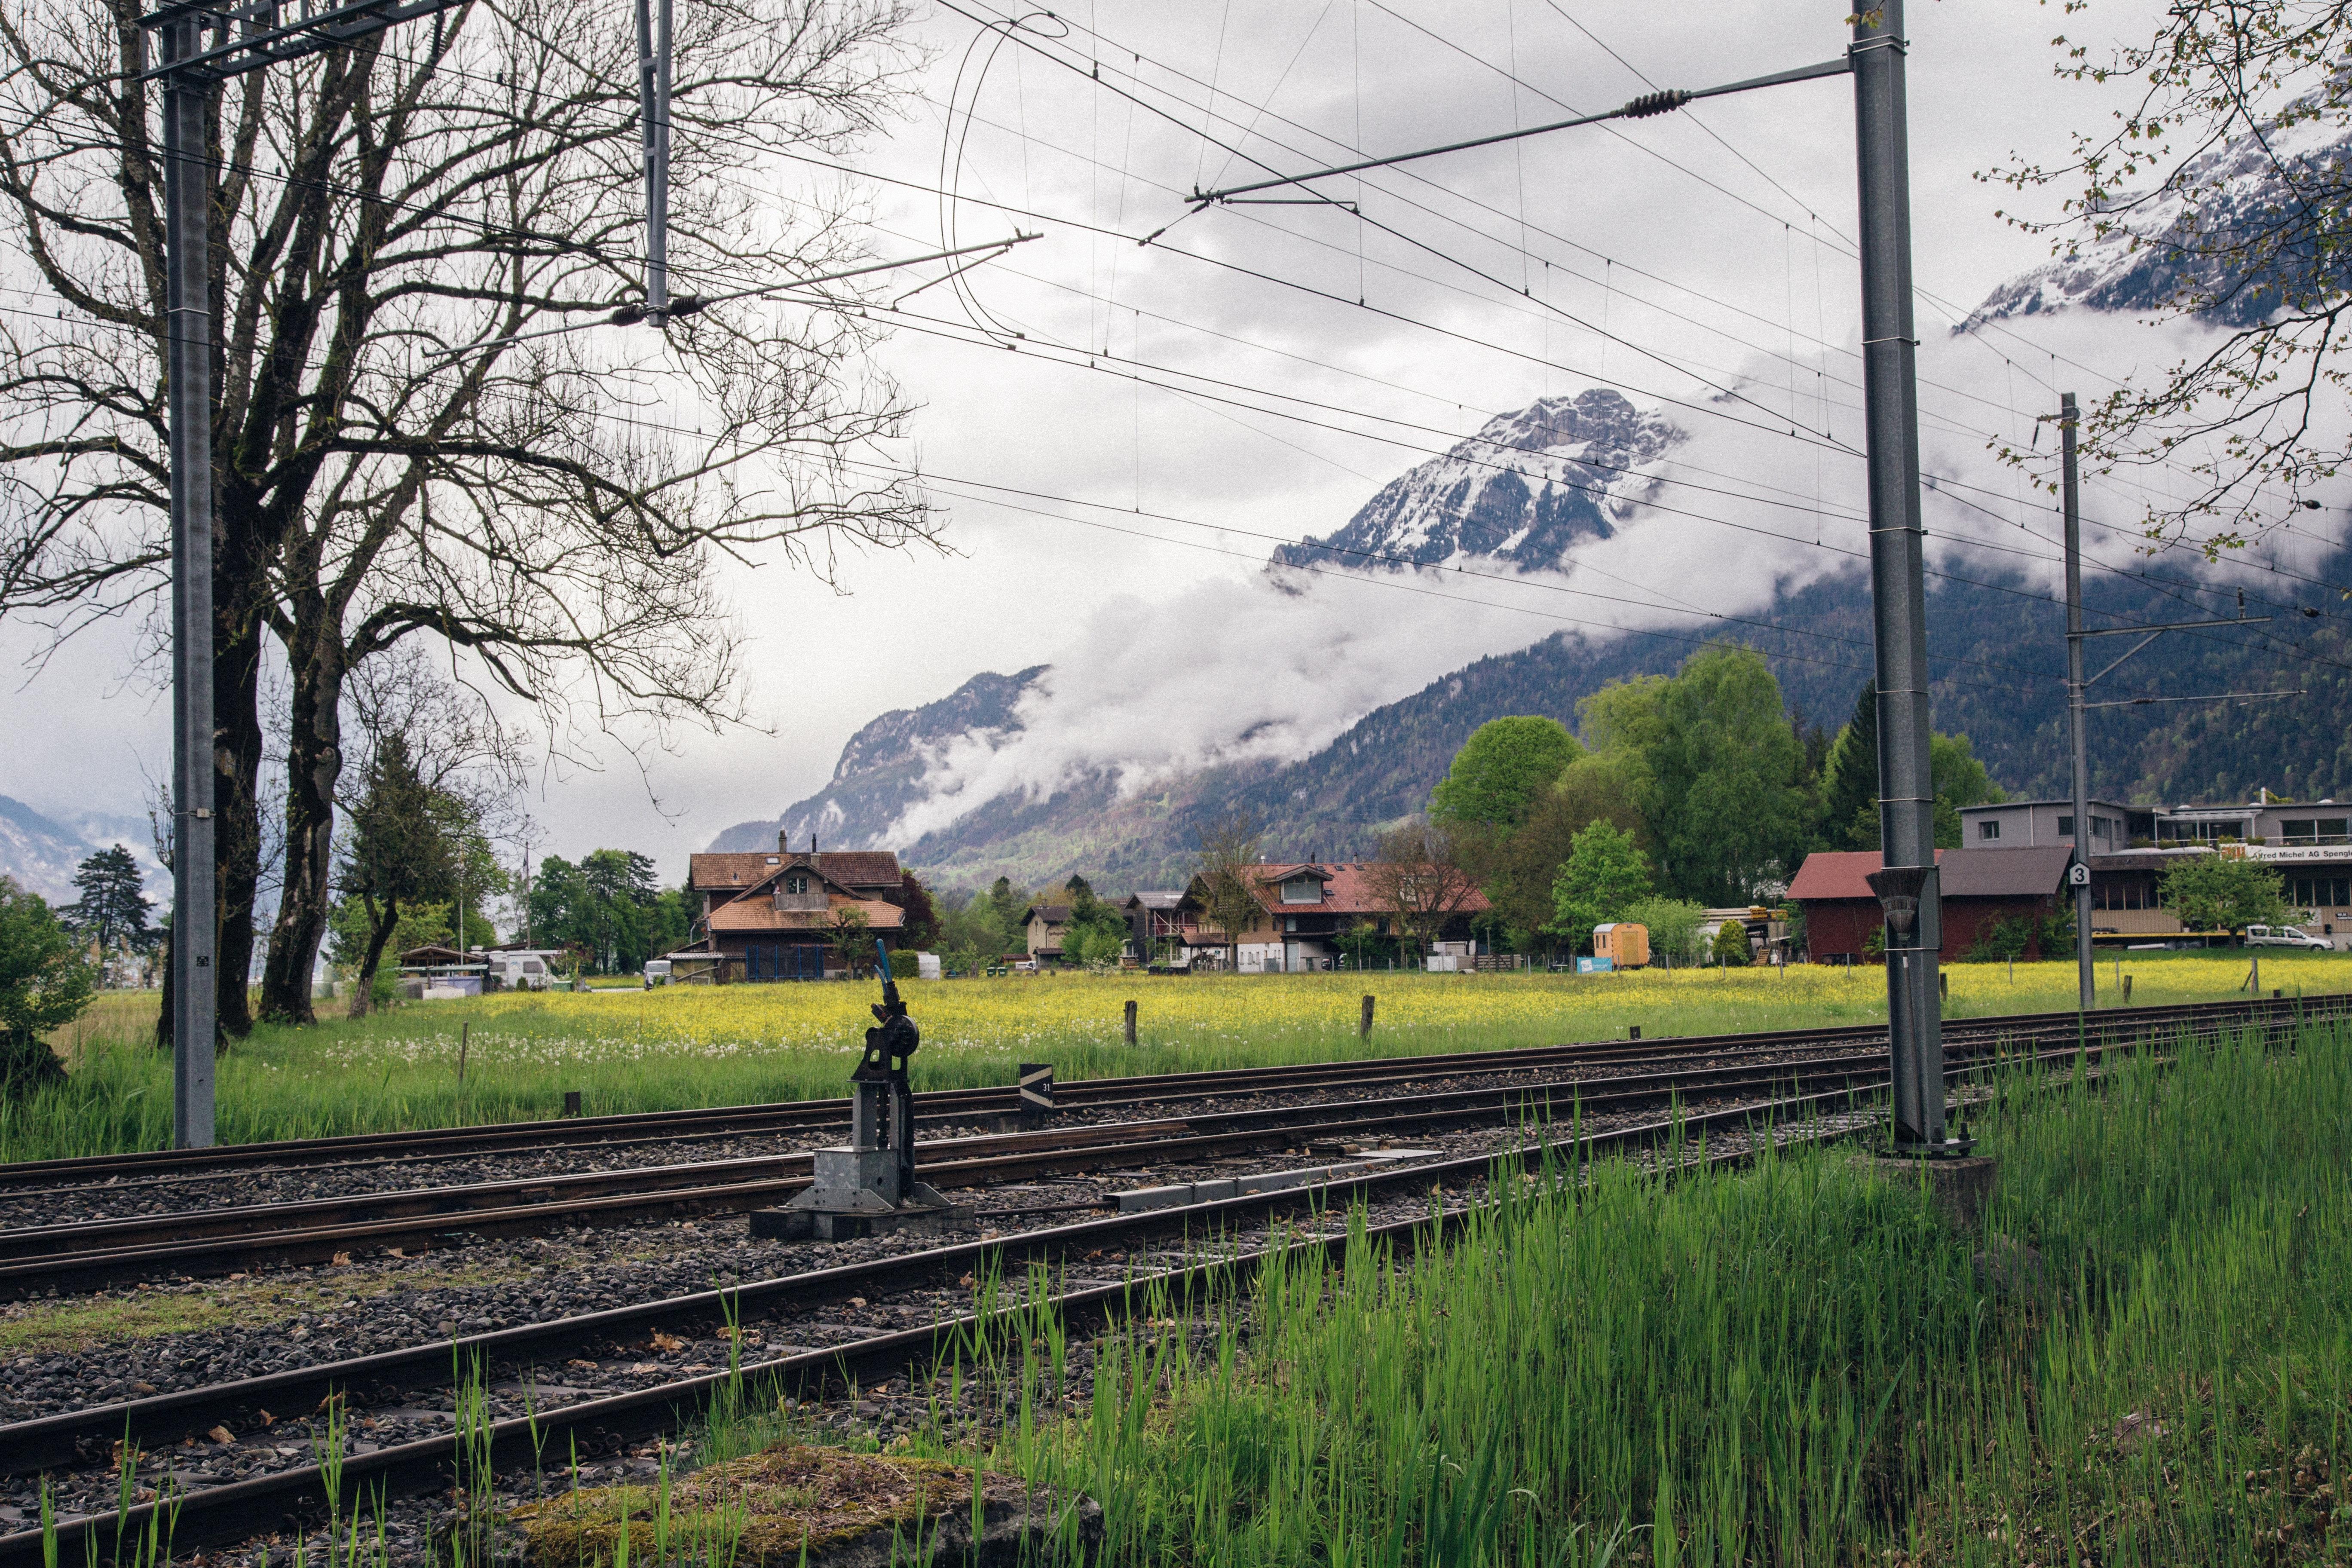 Train Railways, Clouds, Railroad track, Trees, Travel, HQ Photo